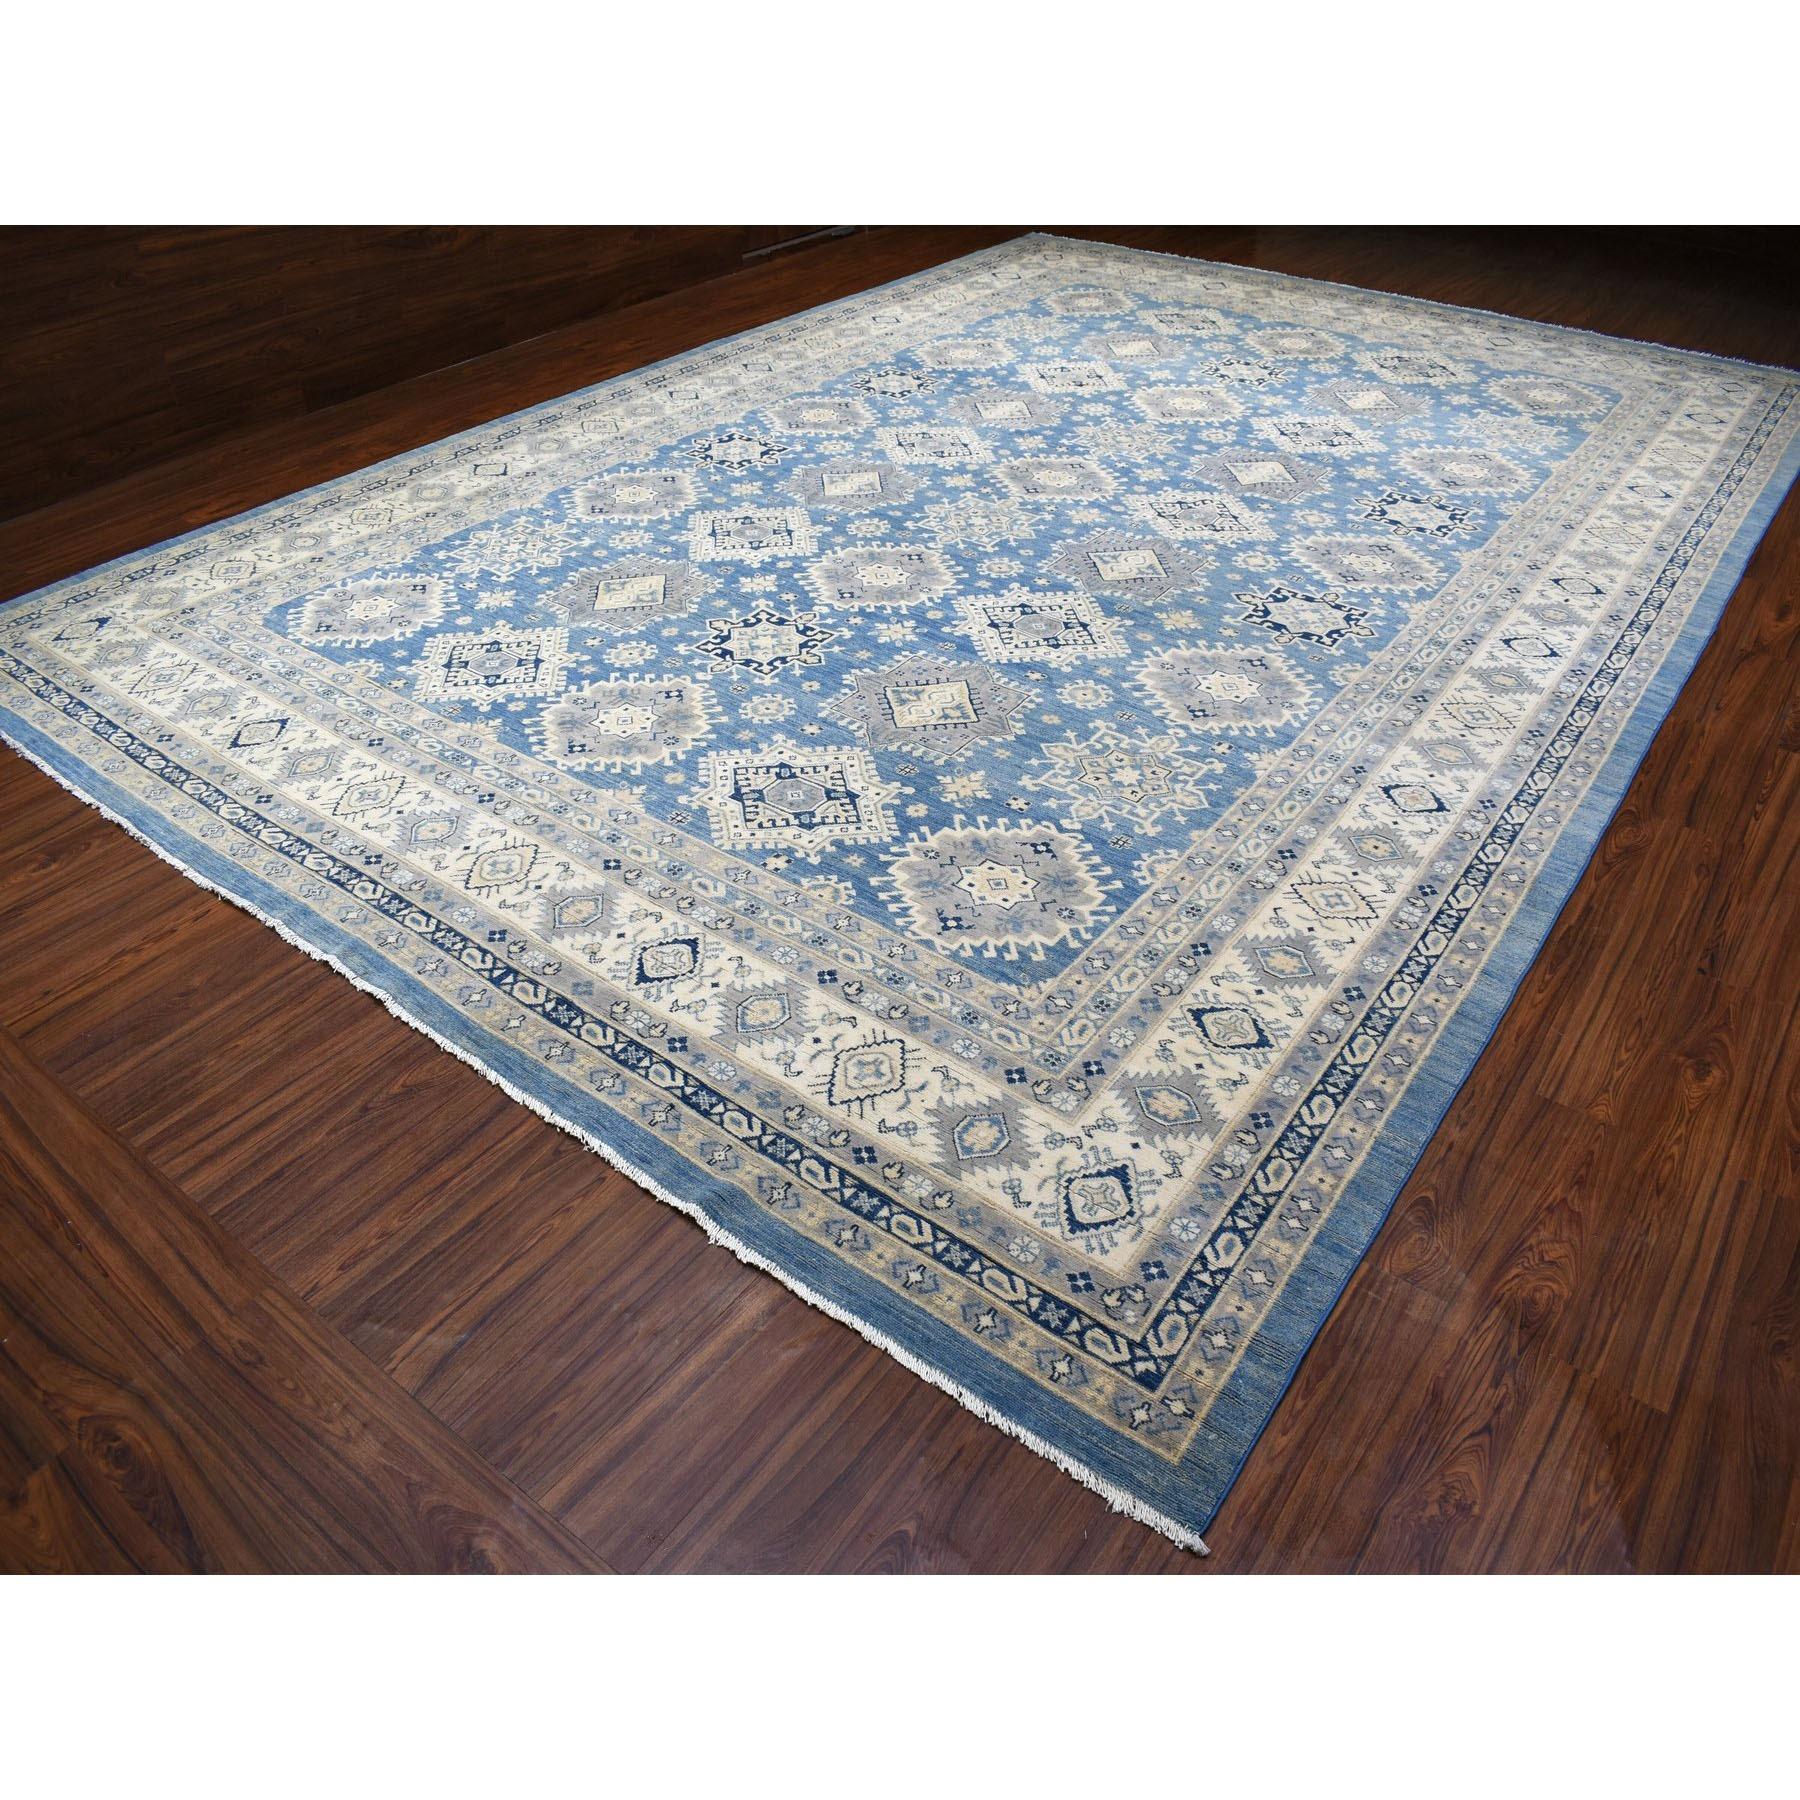 "12'1""x17'5"" Oversized Blue Vintage Look Kazak Hand Knotted Natural Wool Oriental Rug"